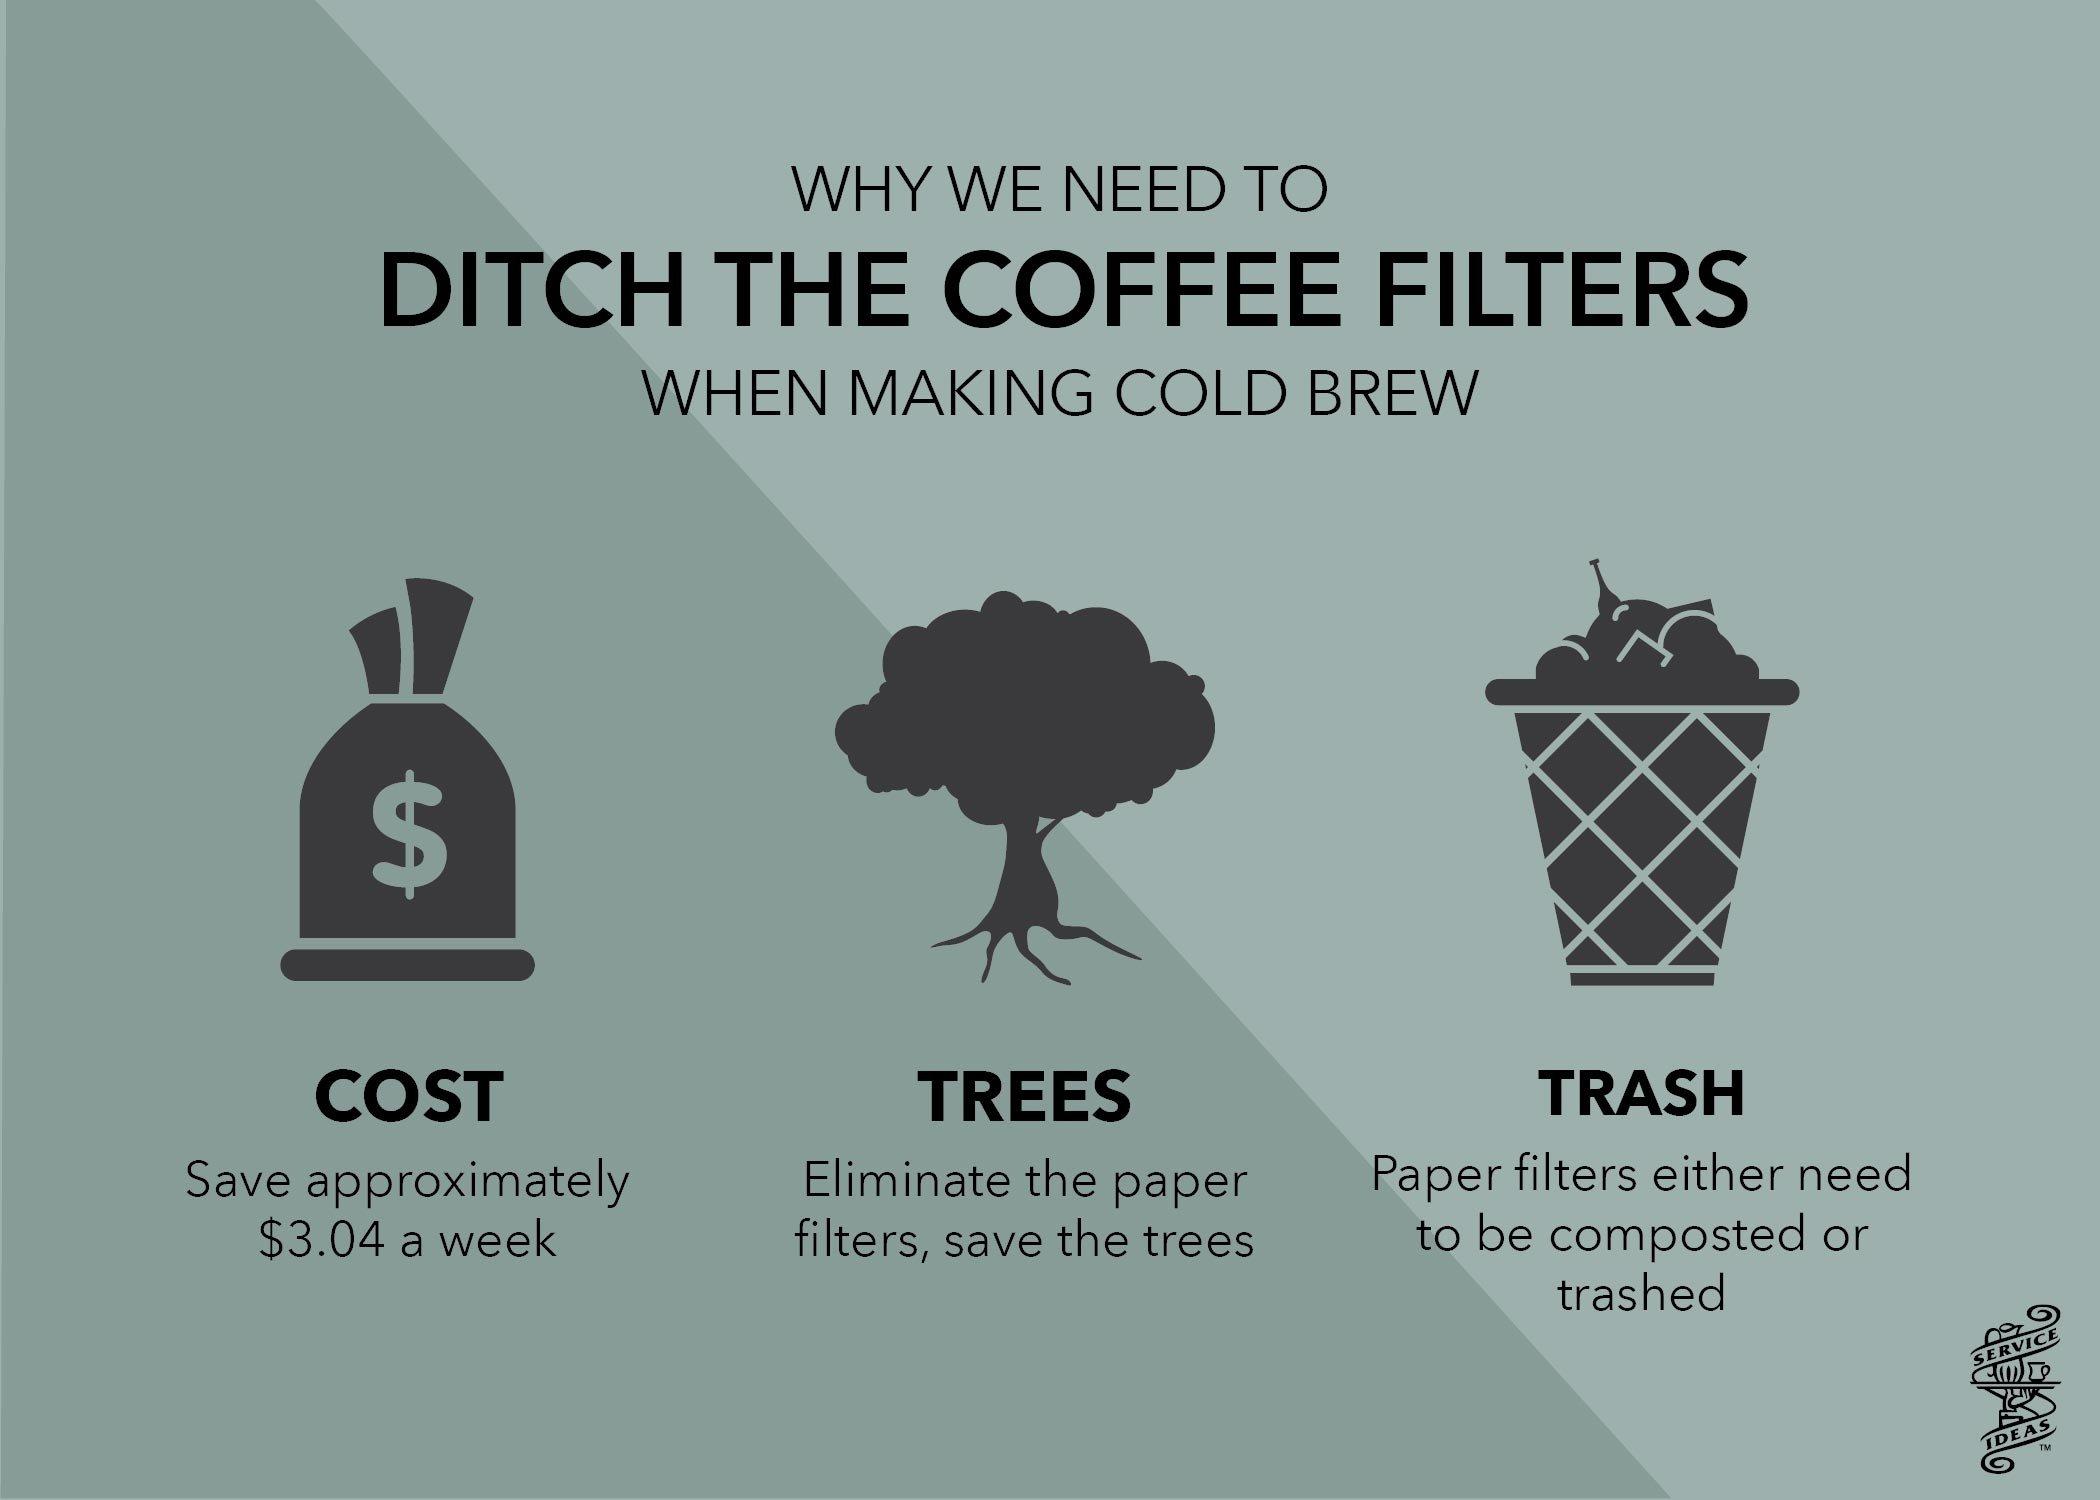 CoffeeFilters_2-01-01